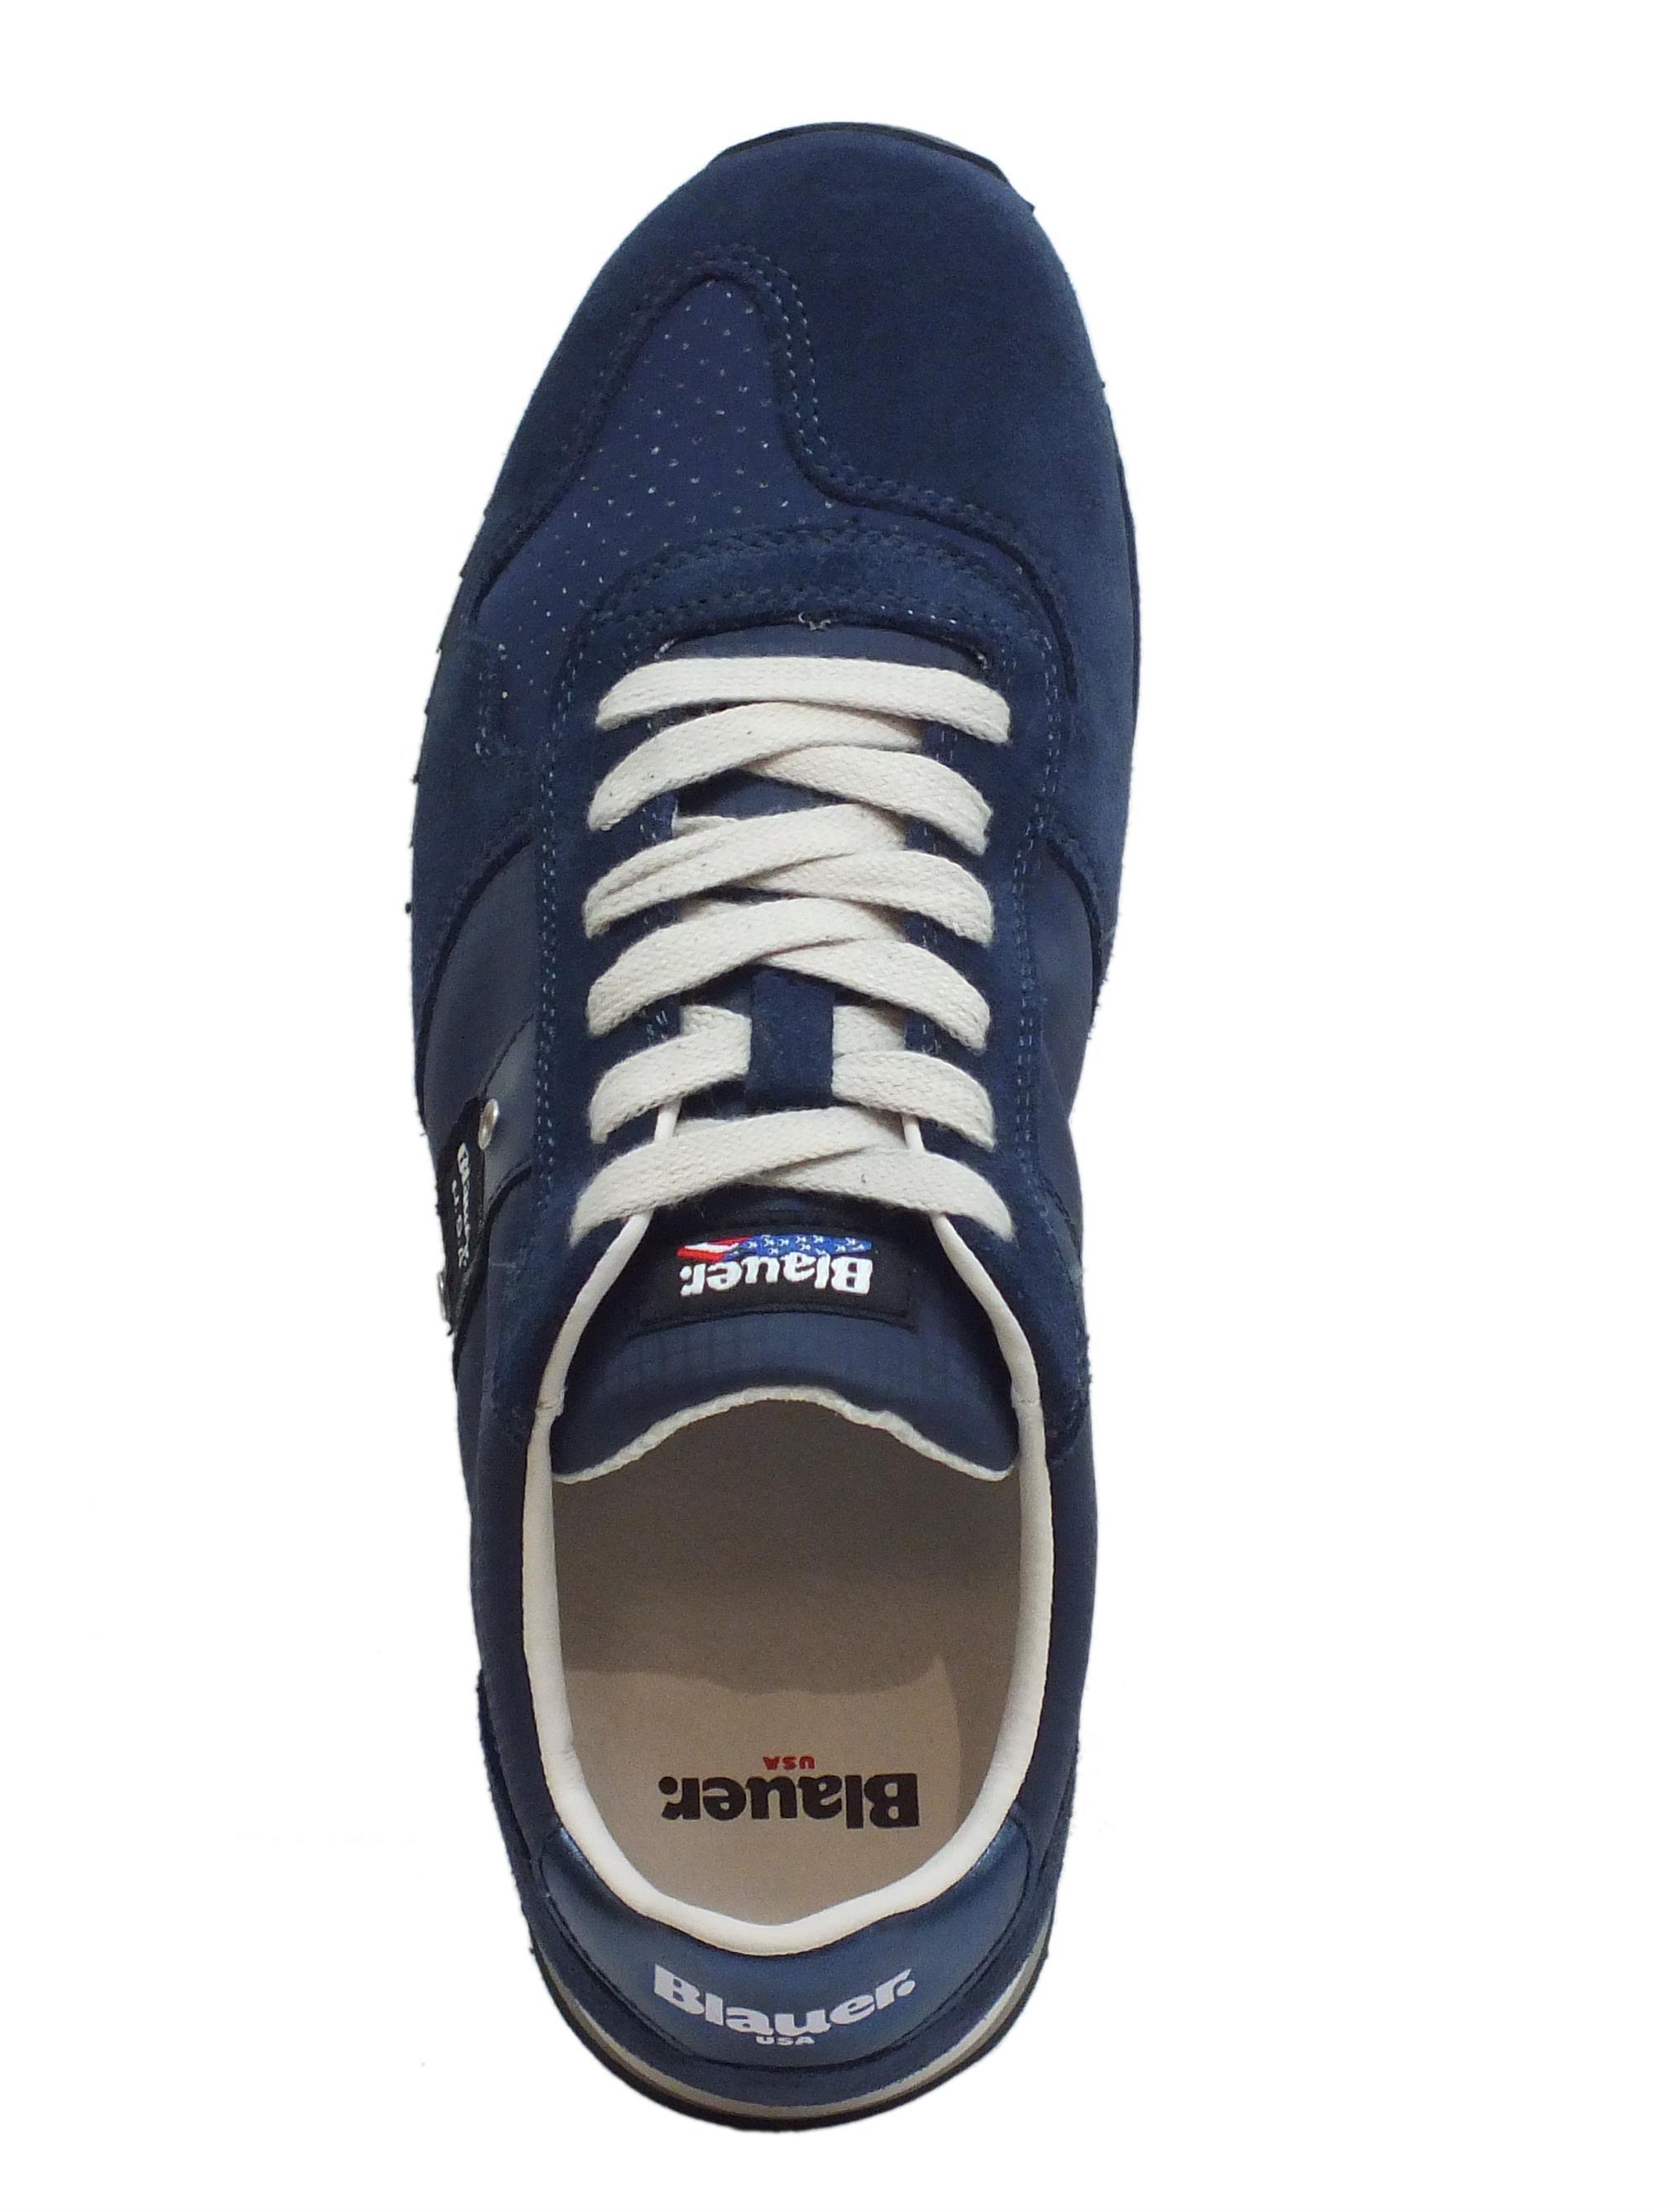 Sneakers Blauer USA uomo camoscio blu tessuto blu - Vitiello Calzature 0d9575d5cda